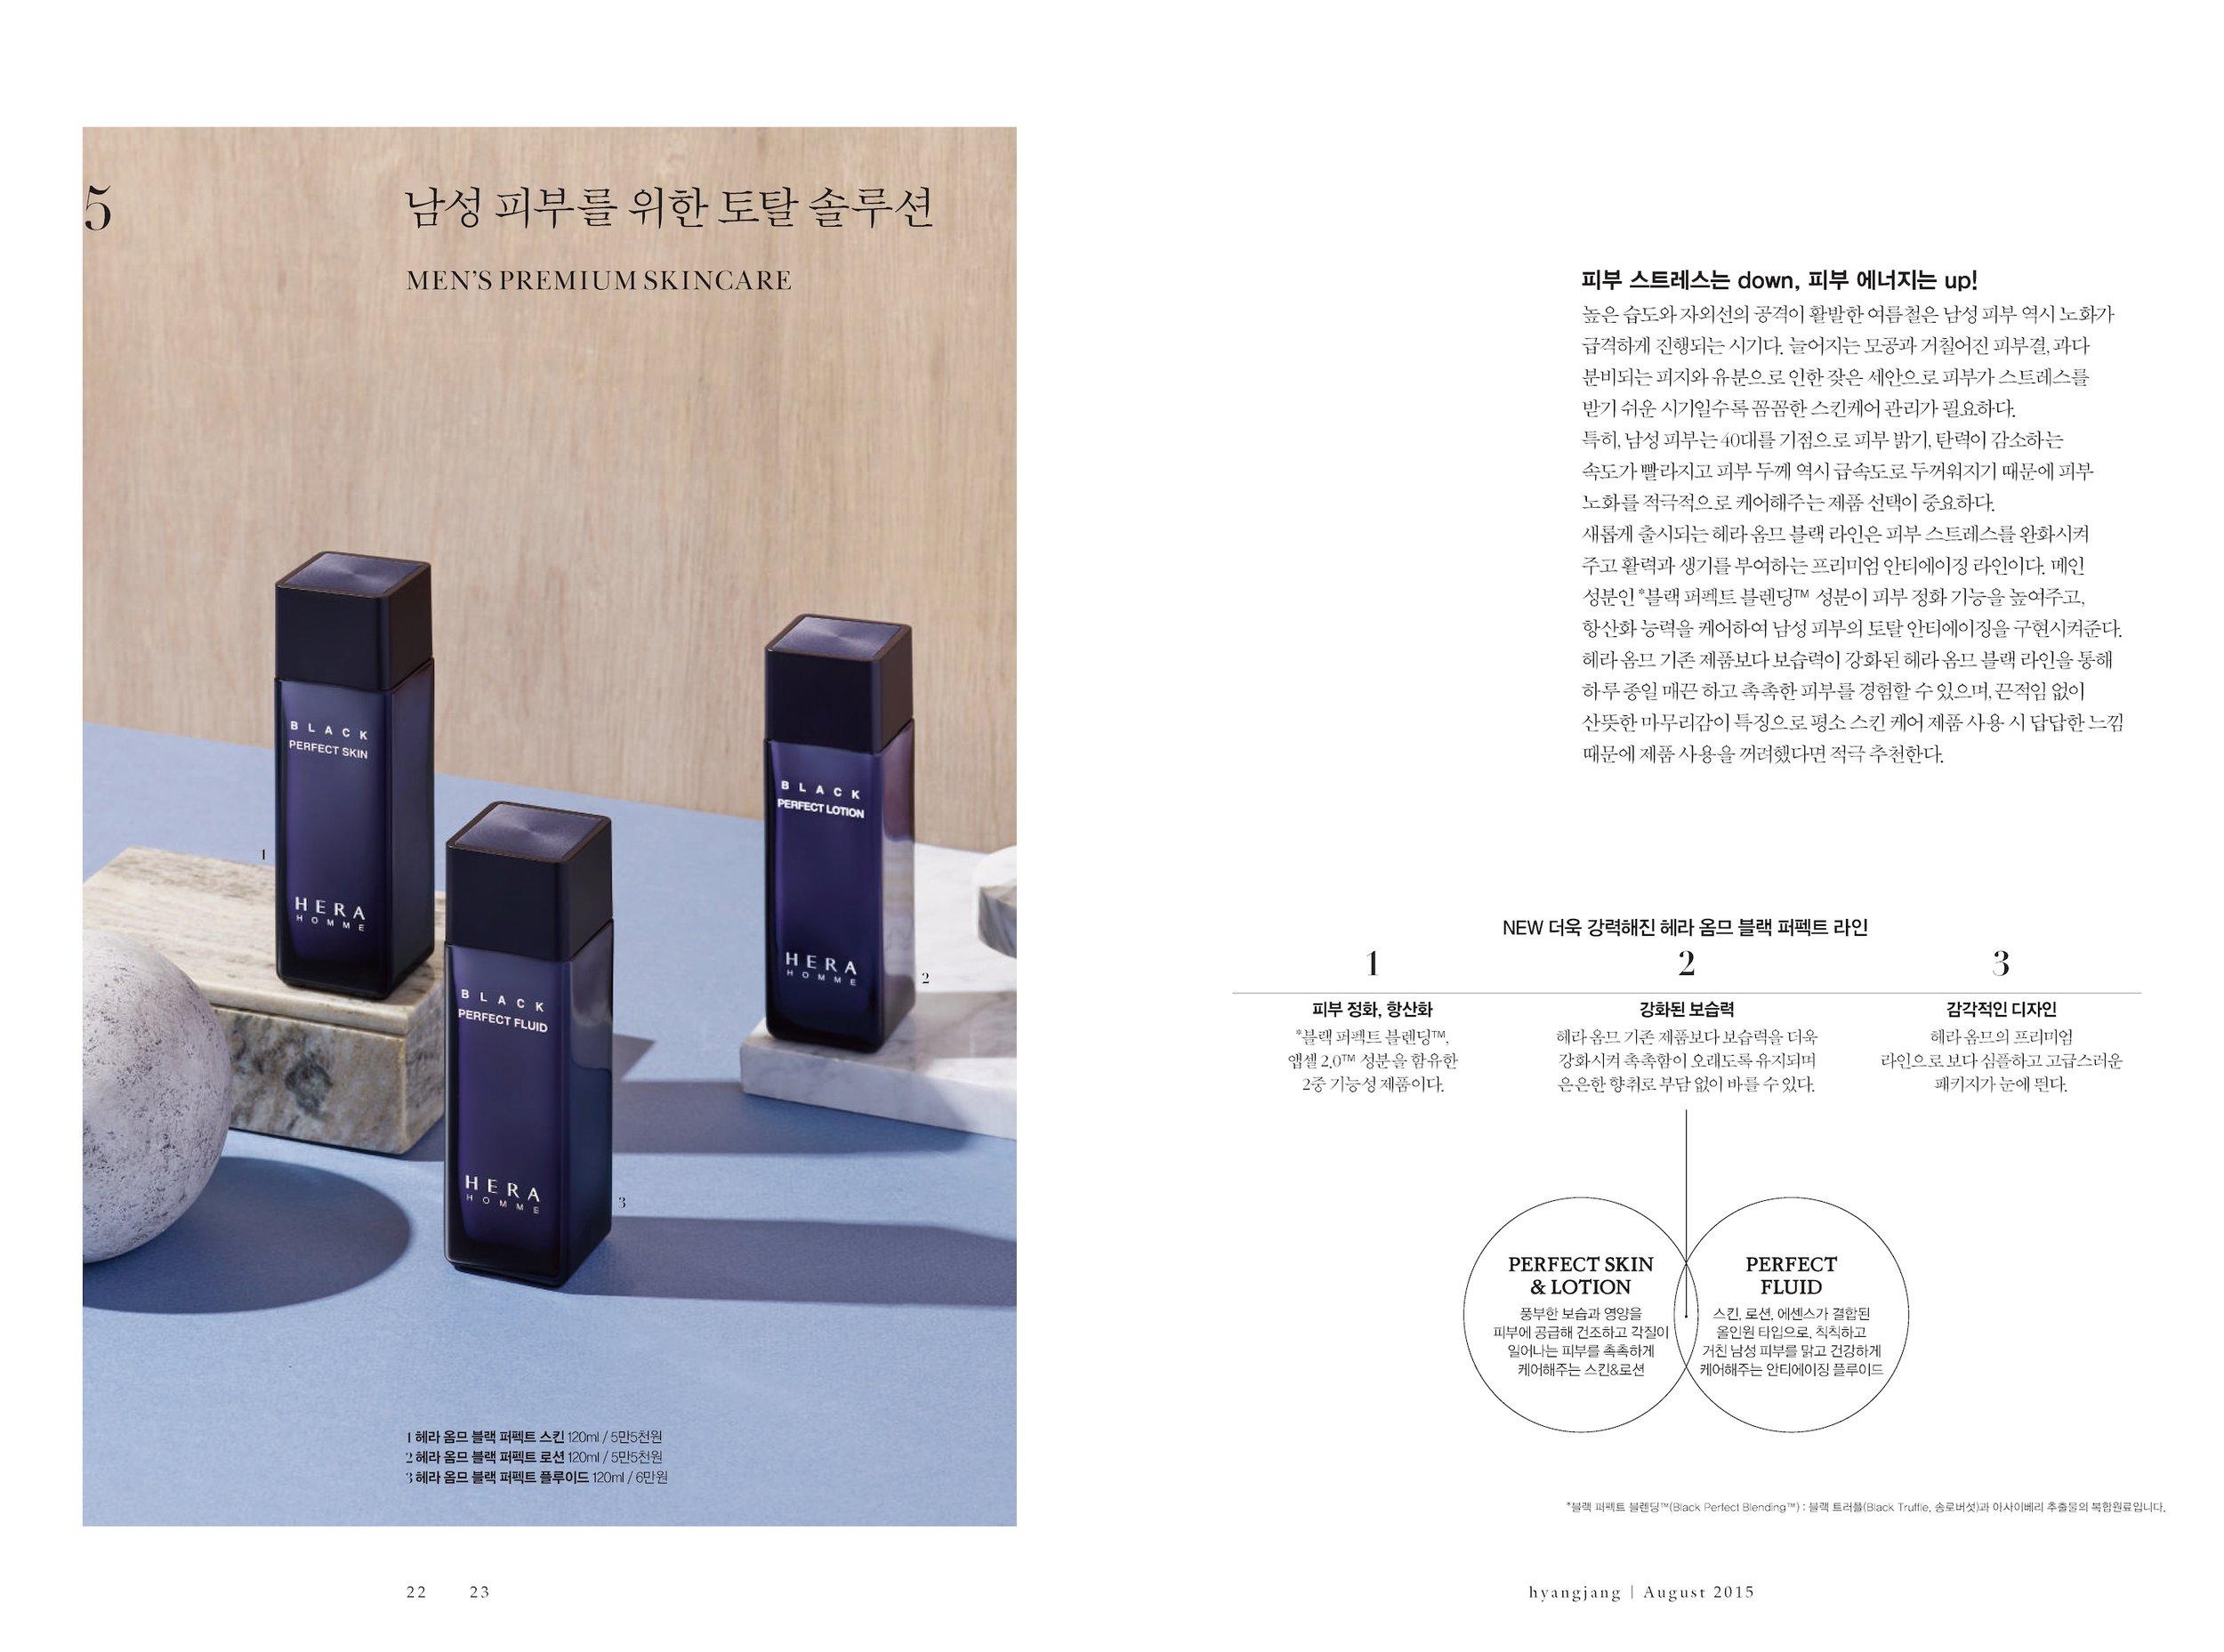 hyangjang-201508_페이지_12.jpeg